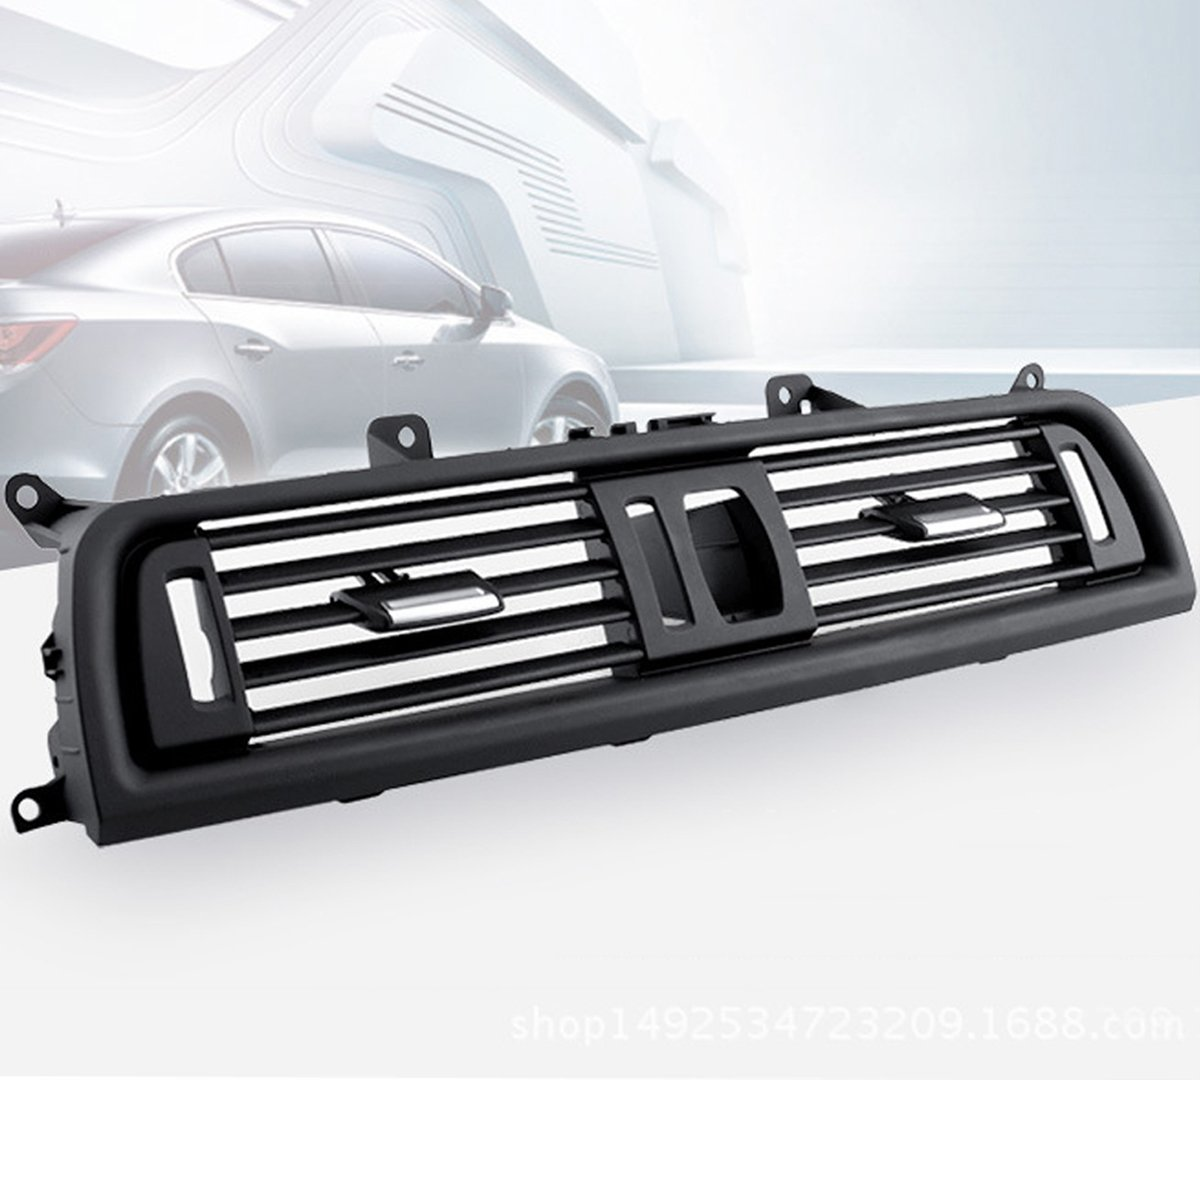 Viviance Car Front Dash Panel Center Fresh Air Outlet Vent Grille Cover F/ür BMW 5 F10 F18